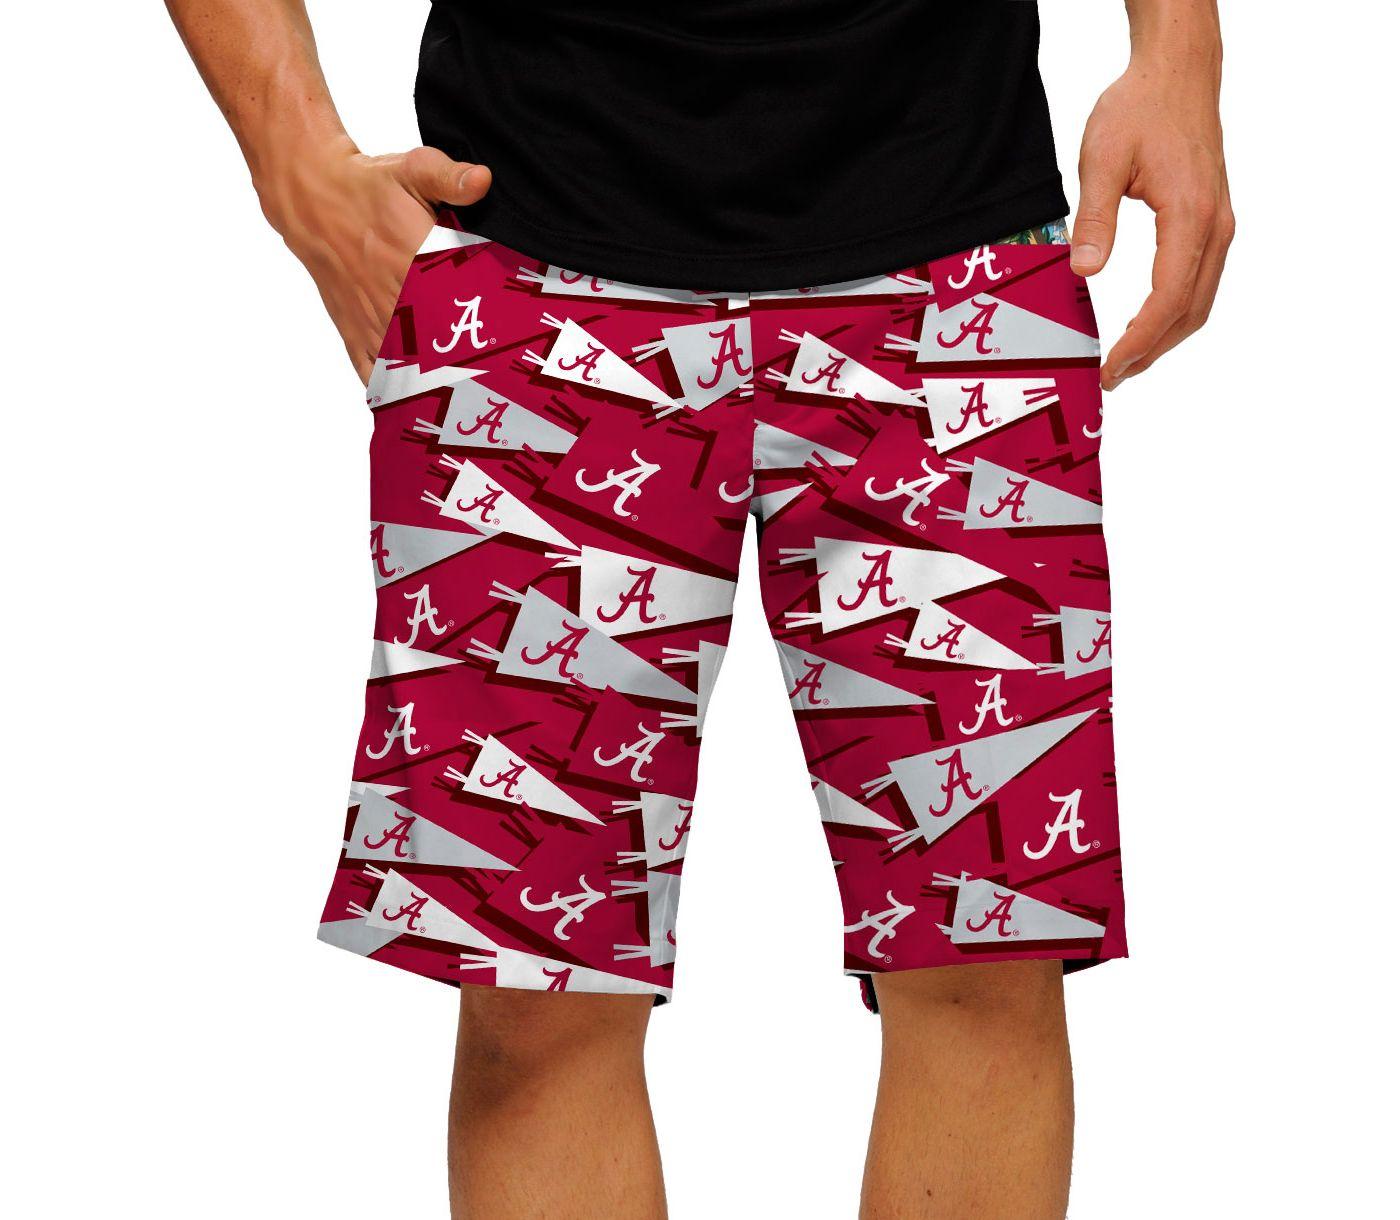 Loudmouth Men's Alabama Crimson Tide 'Roll Tide' Golf Shorts